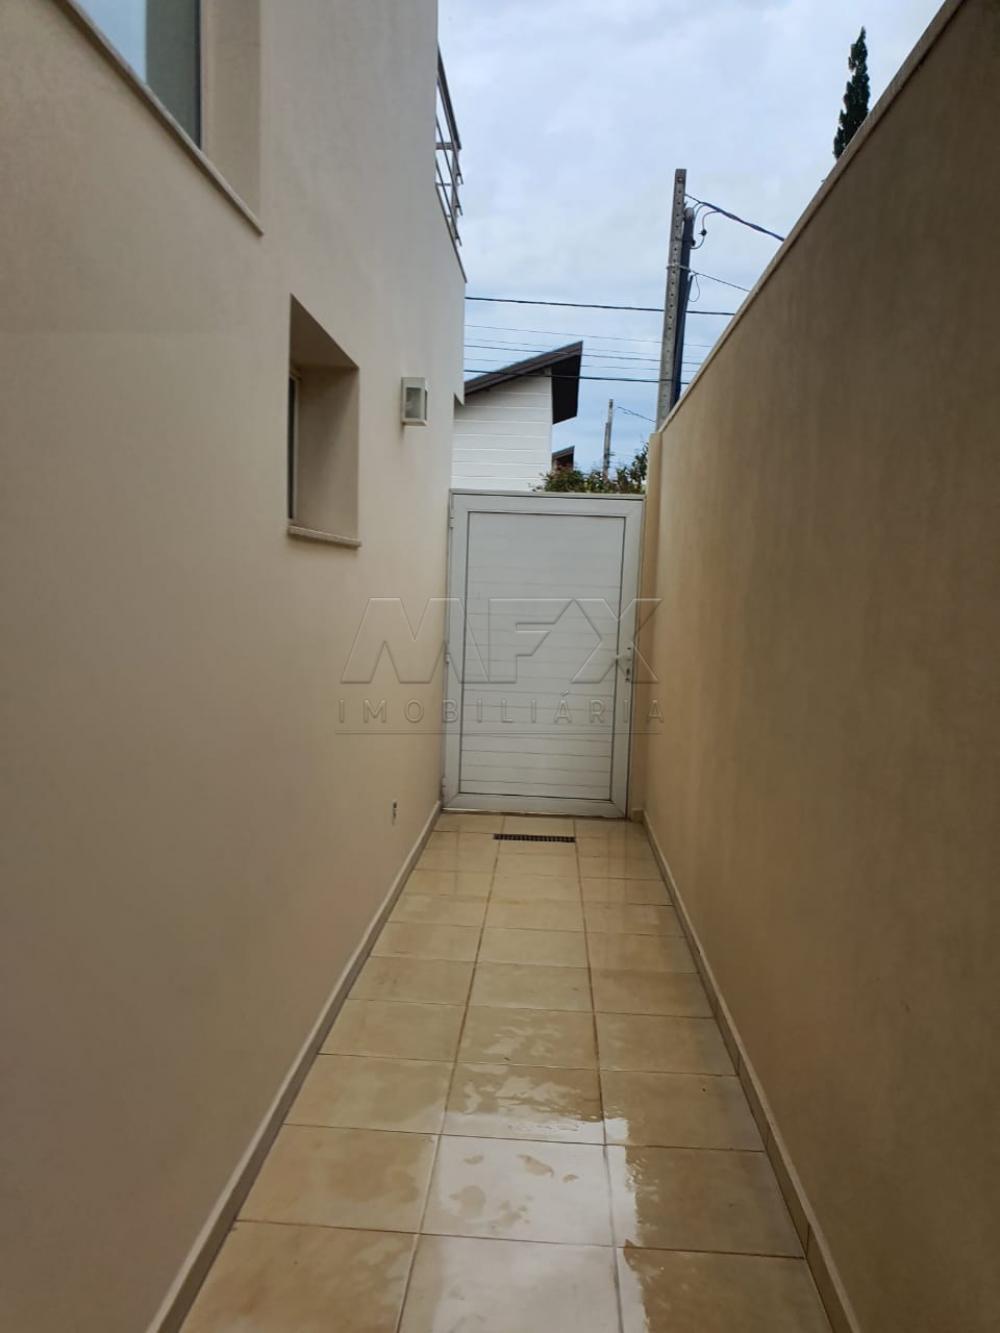 Alugar Casa / Condomínio em Bauru apenas R$ 6.800,00 - Foto 4